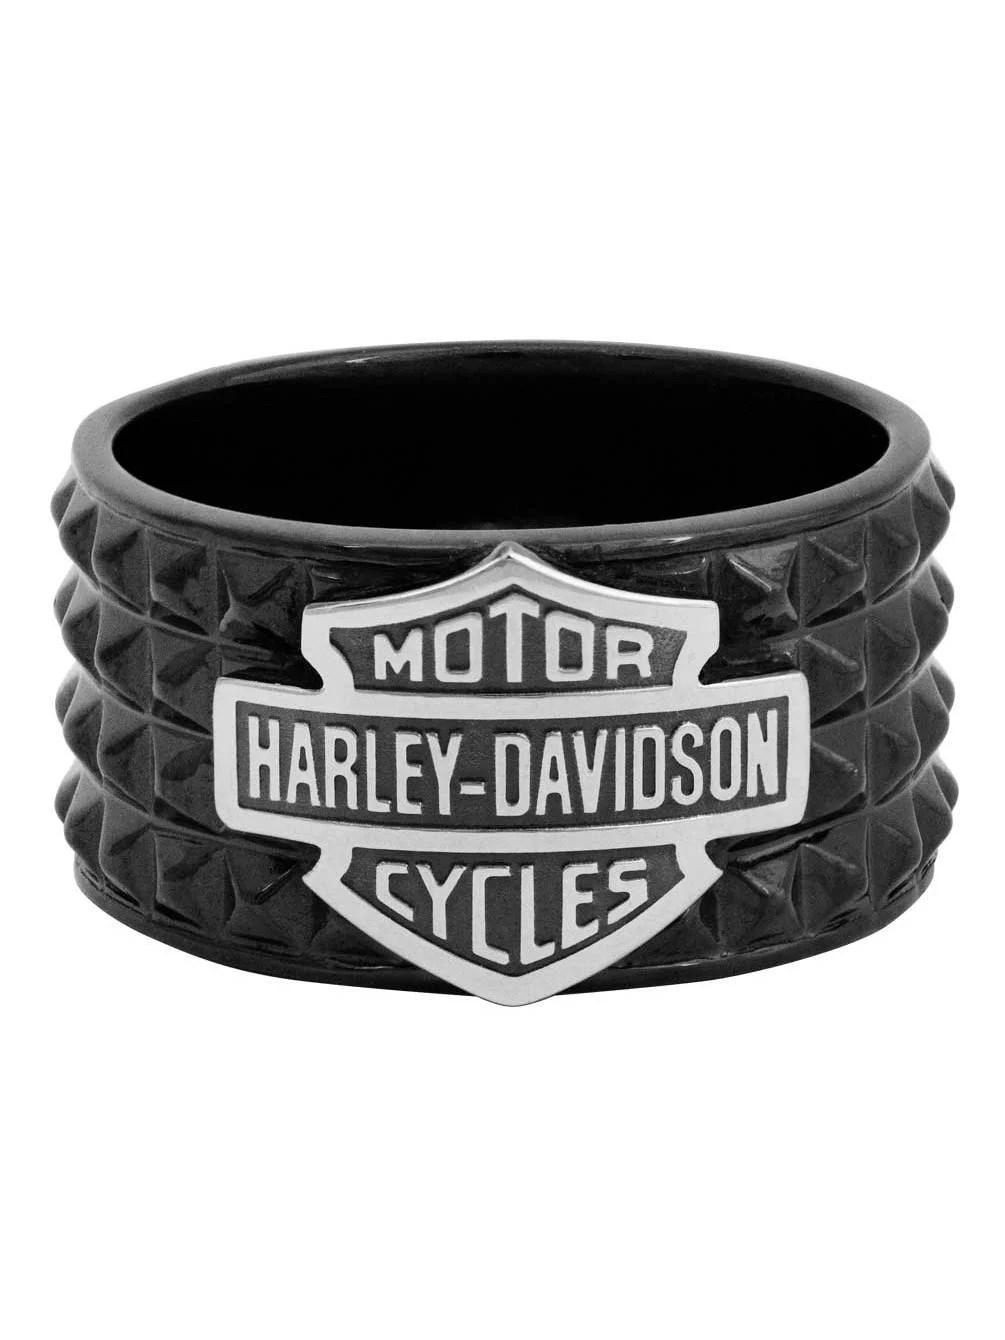 Harley Davidson Jewelry Rings : harley, davidson, jewelry, rings, Harley-Davidson, Men's, Jewelry, Black, Walmart.com